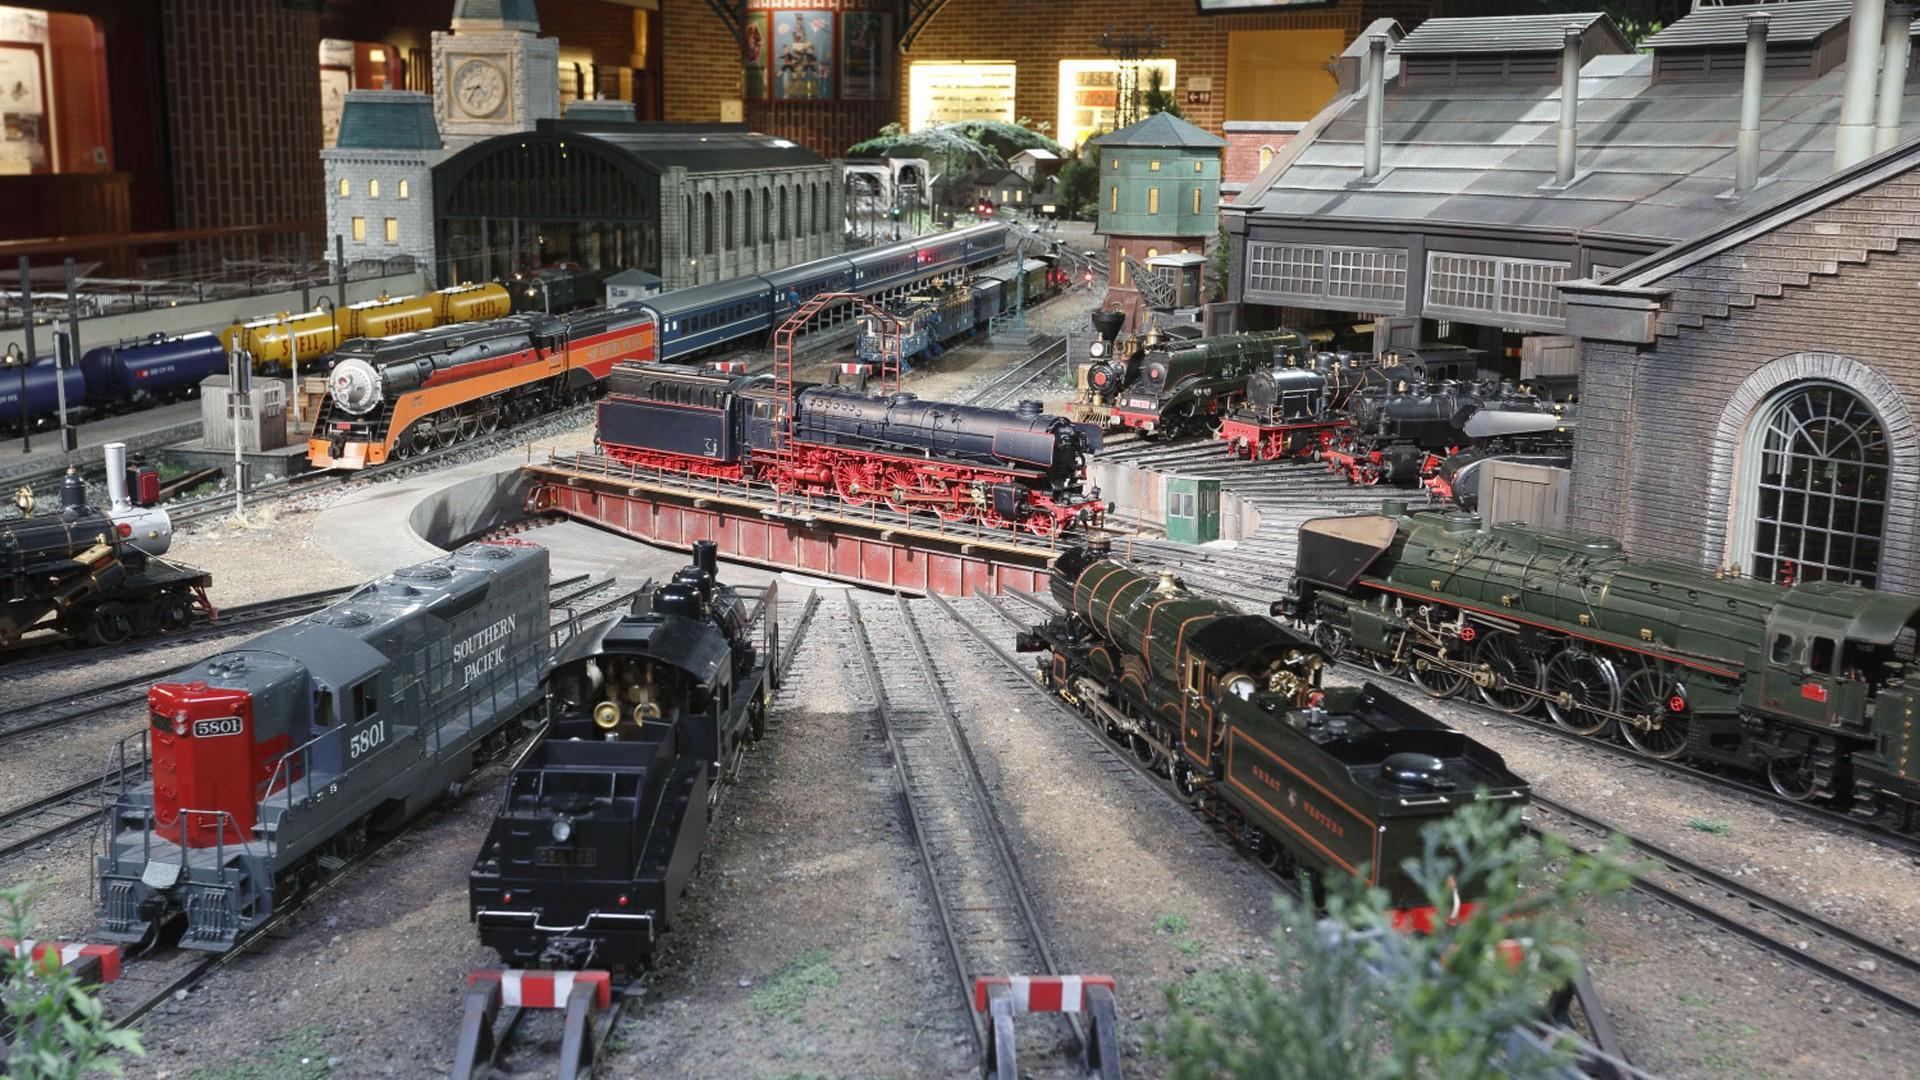 Musée du chemin de fer miniature Hara